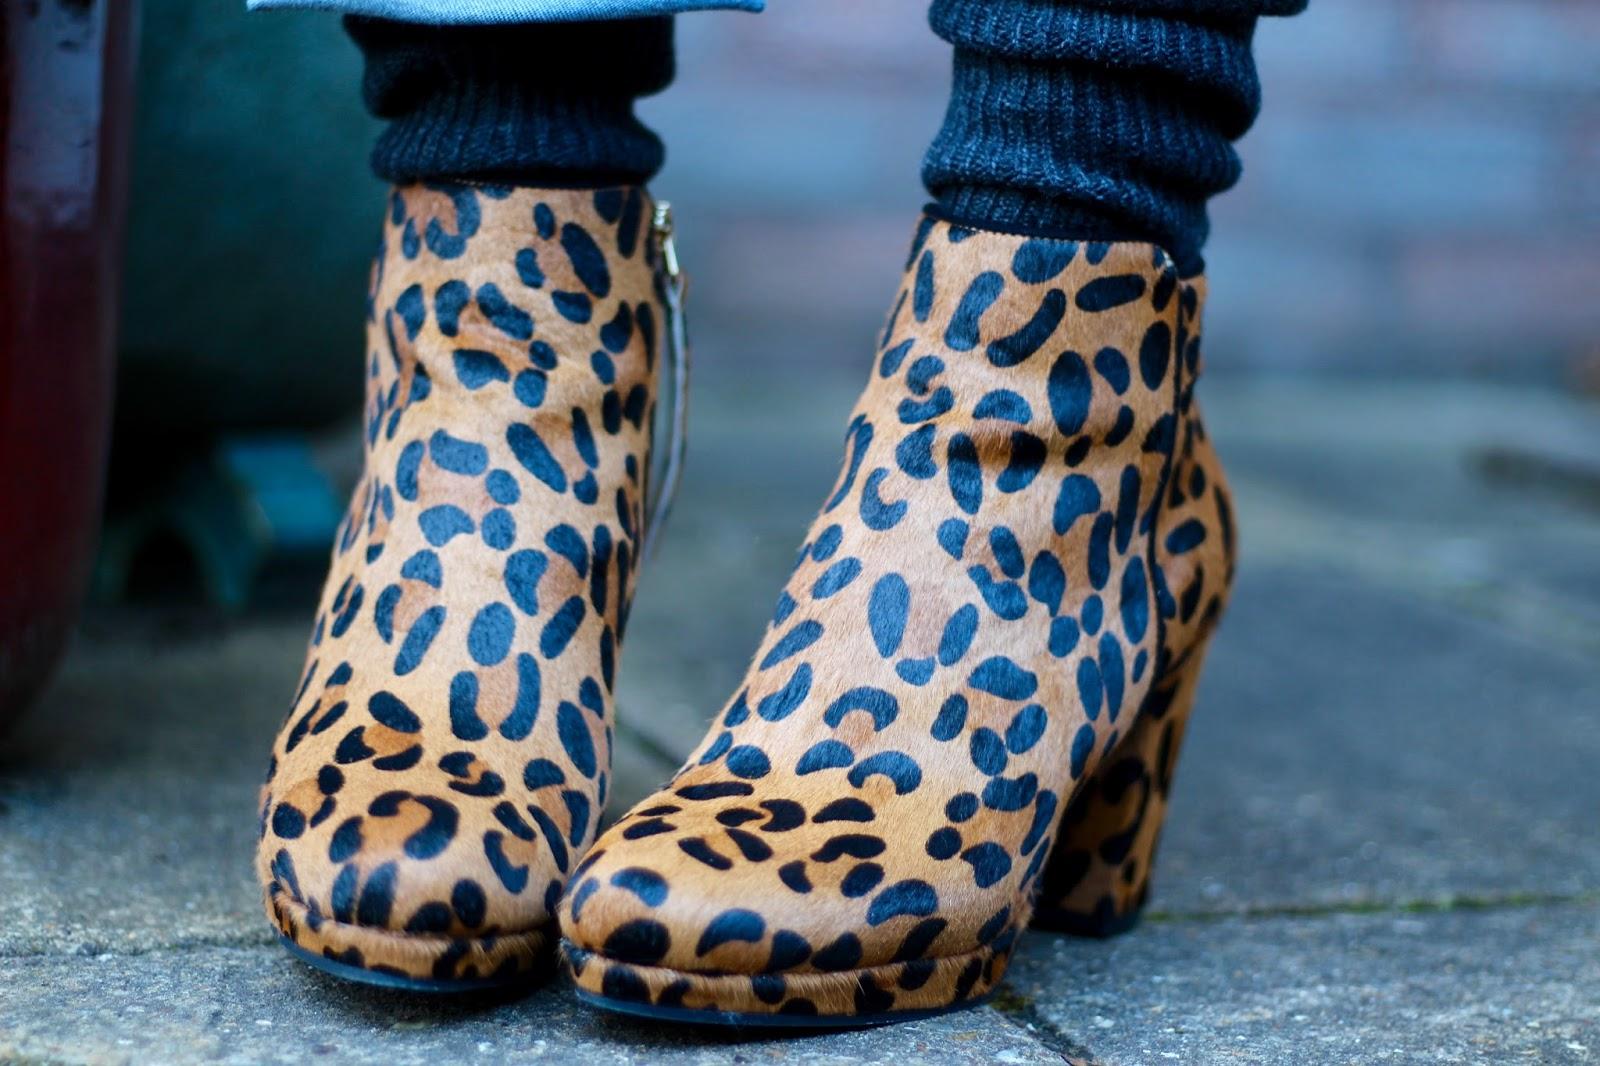 Leopard platform Boots, Cashmere Socks | Winter Style | Fake Fabulous